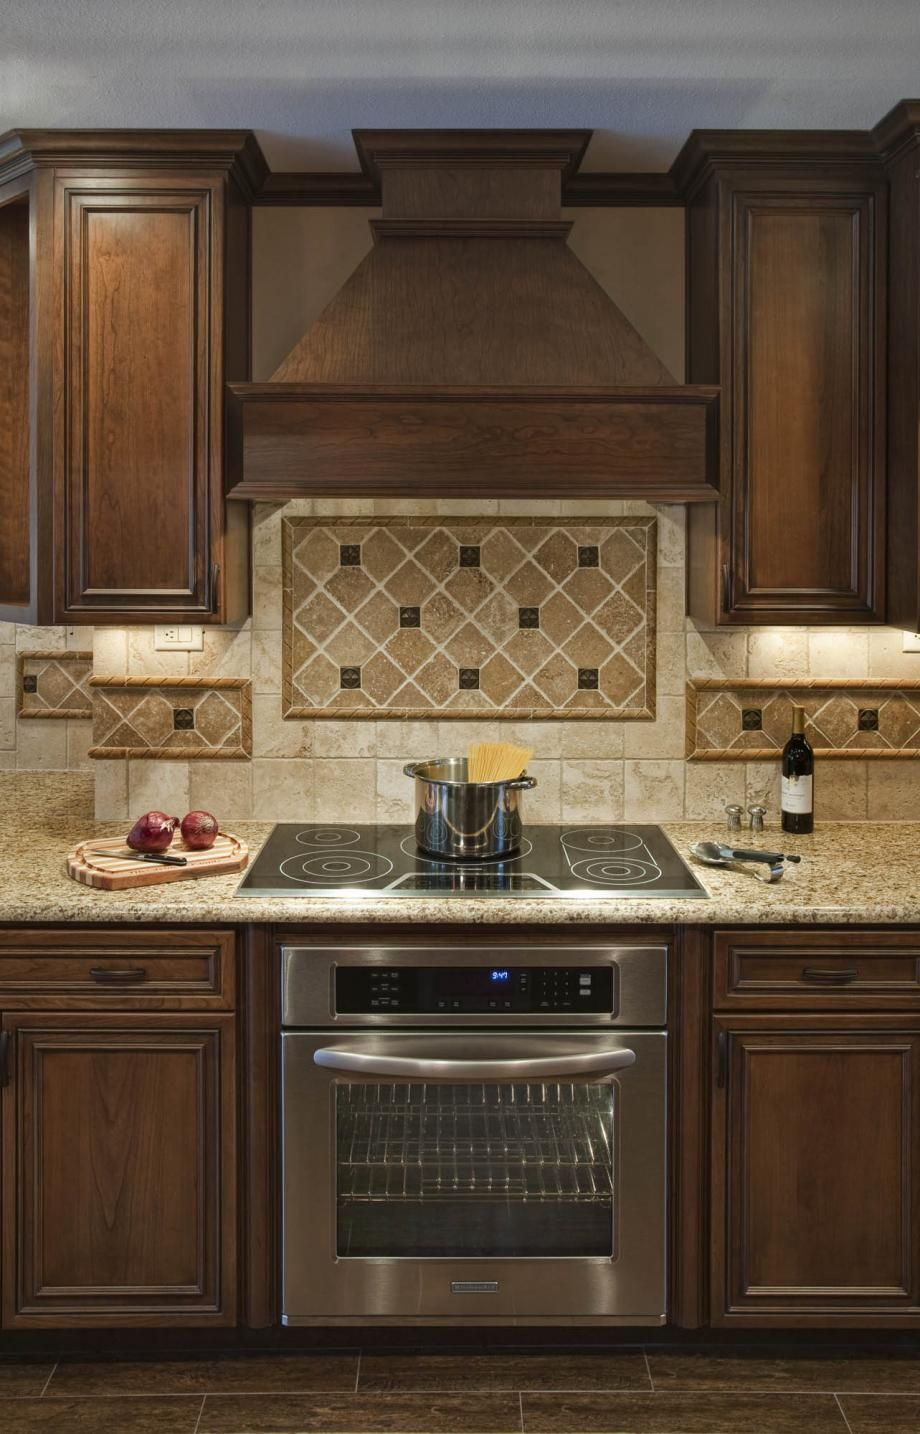 Best Kitchen Gallery: Backsplash Ideas For Under Range Hood Tops Along With Wooden of Kitchen Hood Wood on rachelxblog.com